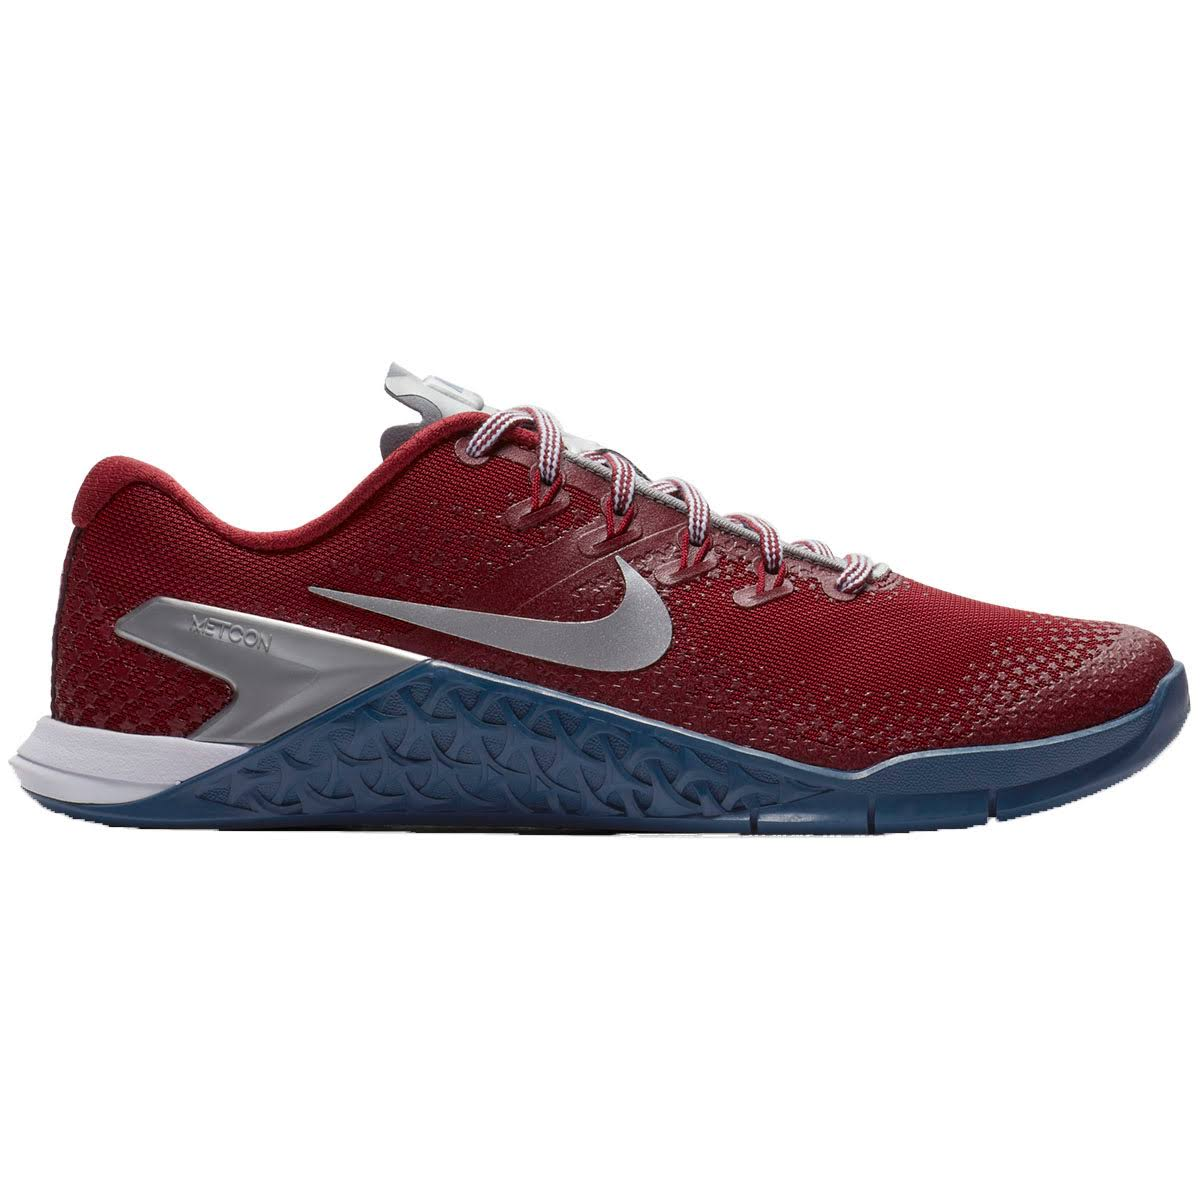 Metcon zilvergym Premium damesGym blauwwit 4 roodmetallic blauwwit8 damesschoenen Nike voor 4jLA5R